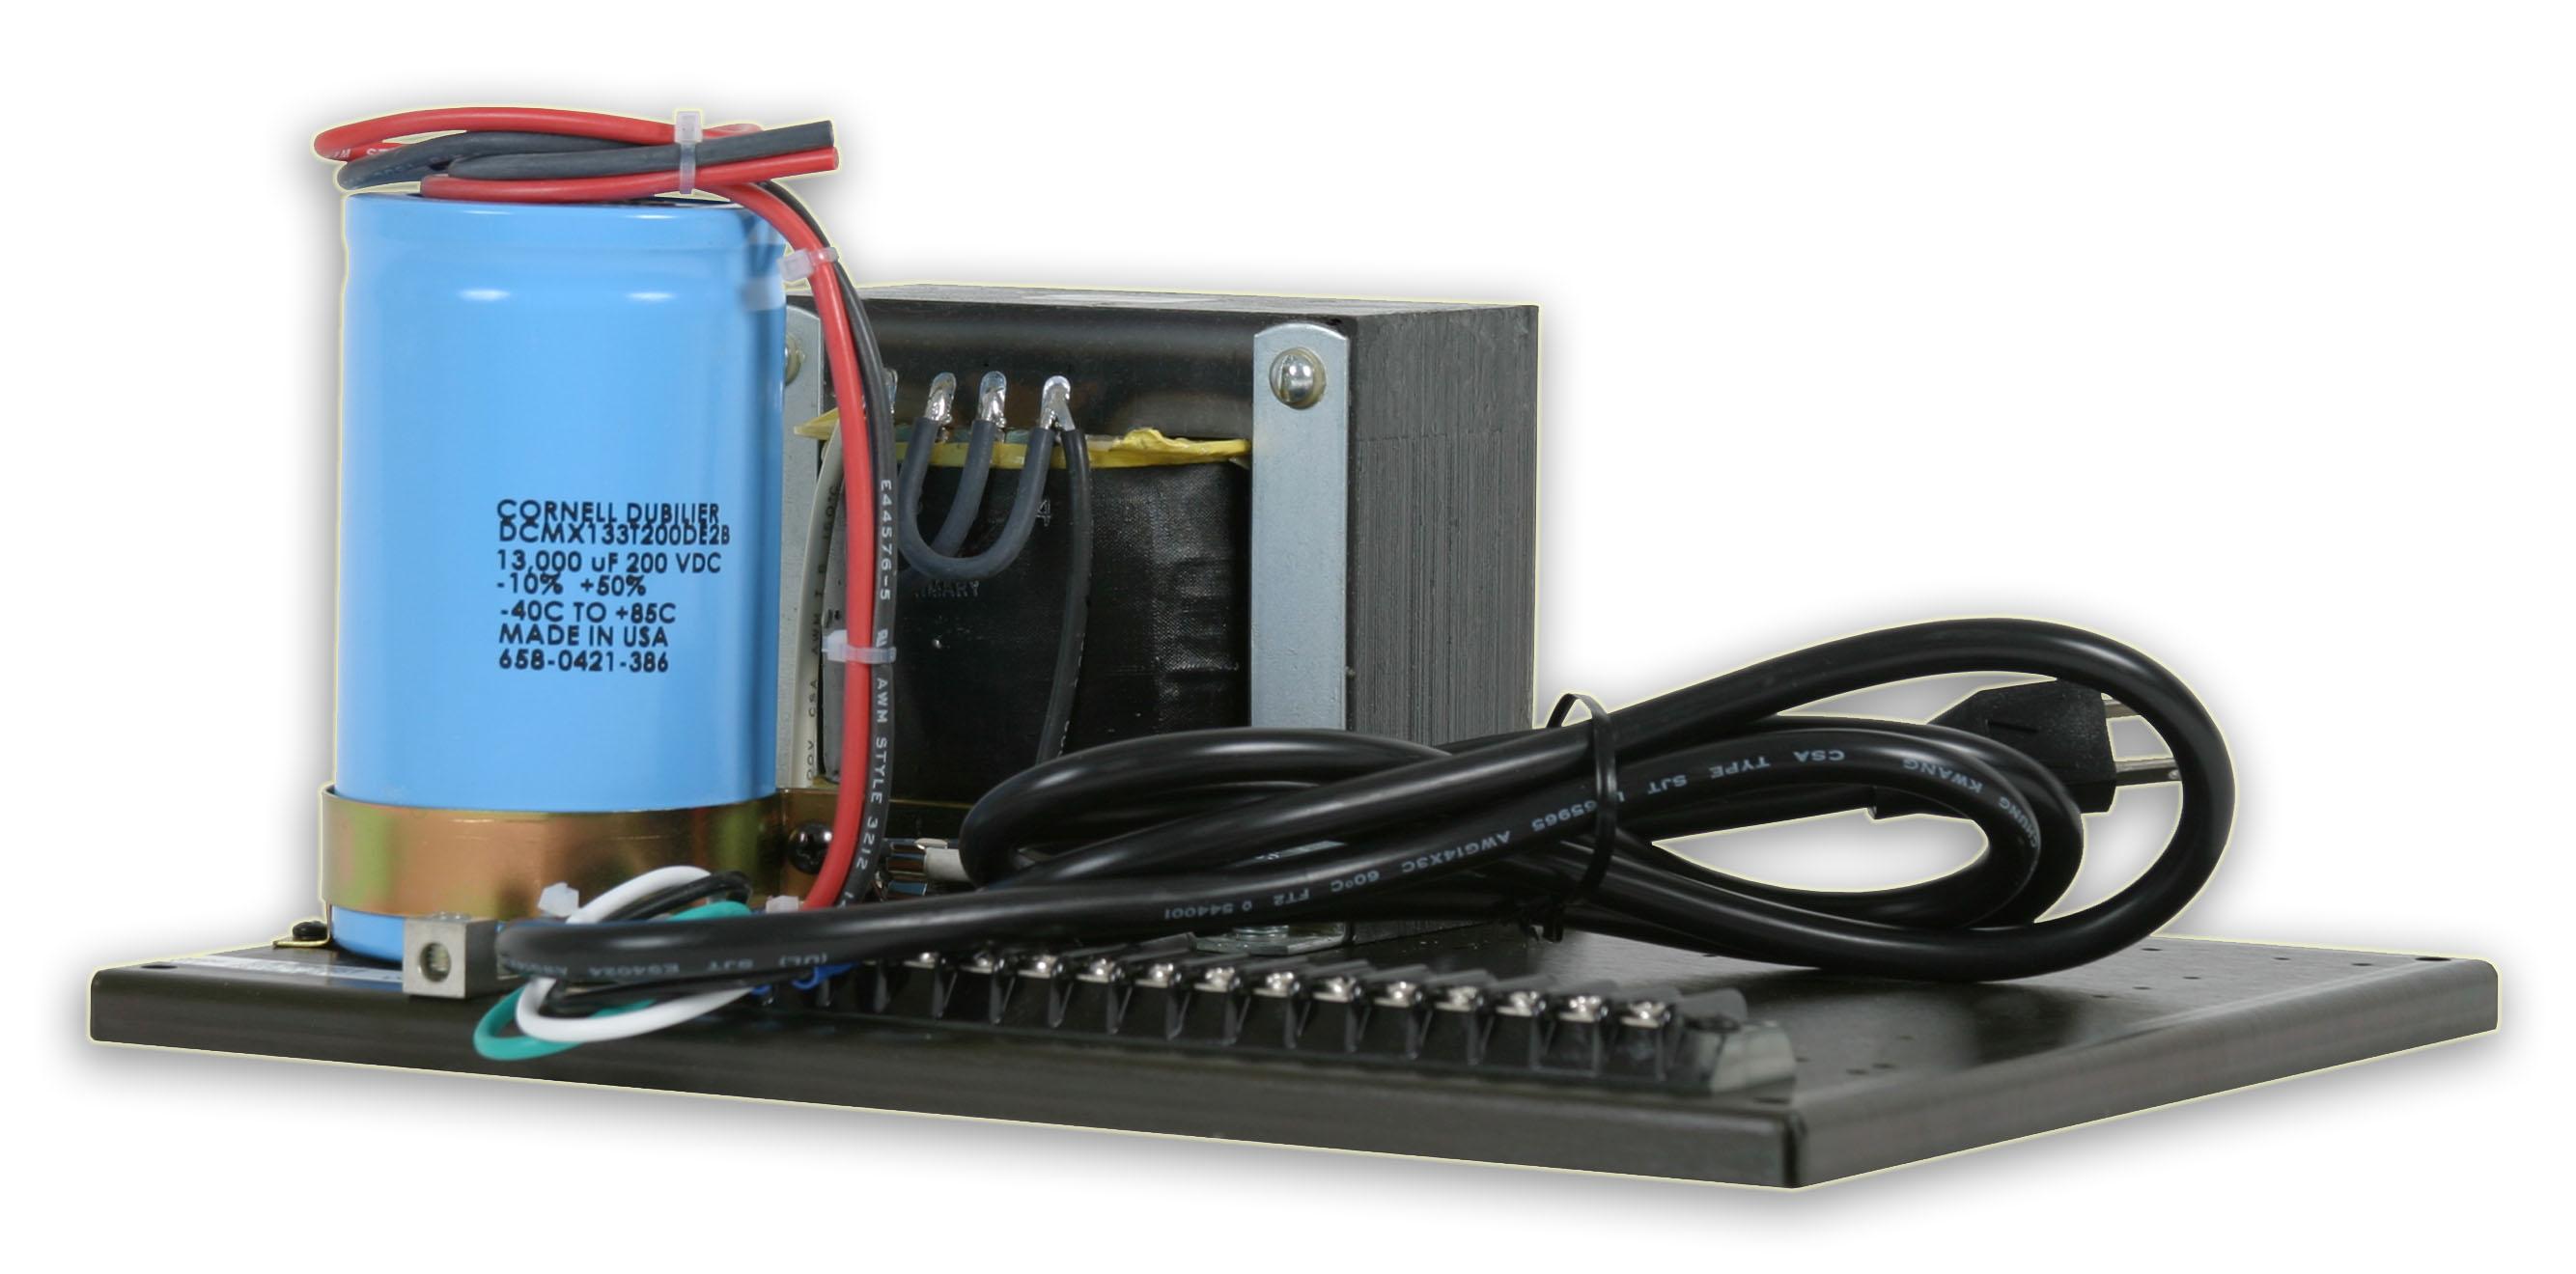 Ps16h120 Power Supply Unregulator Image